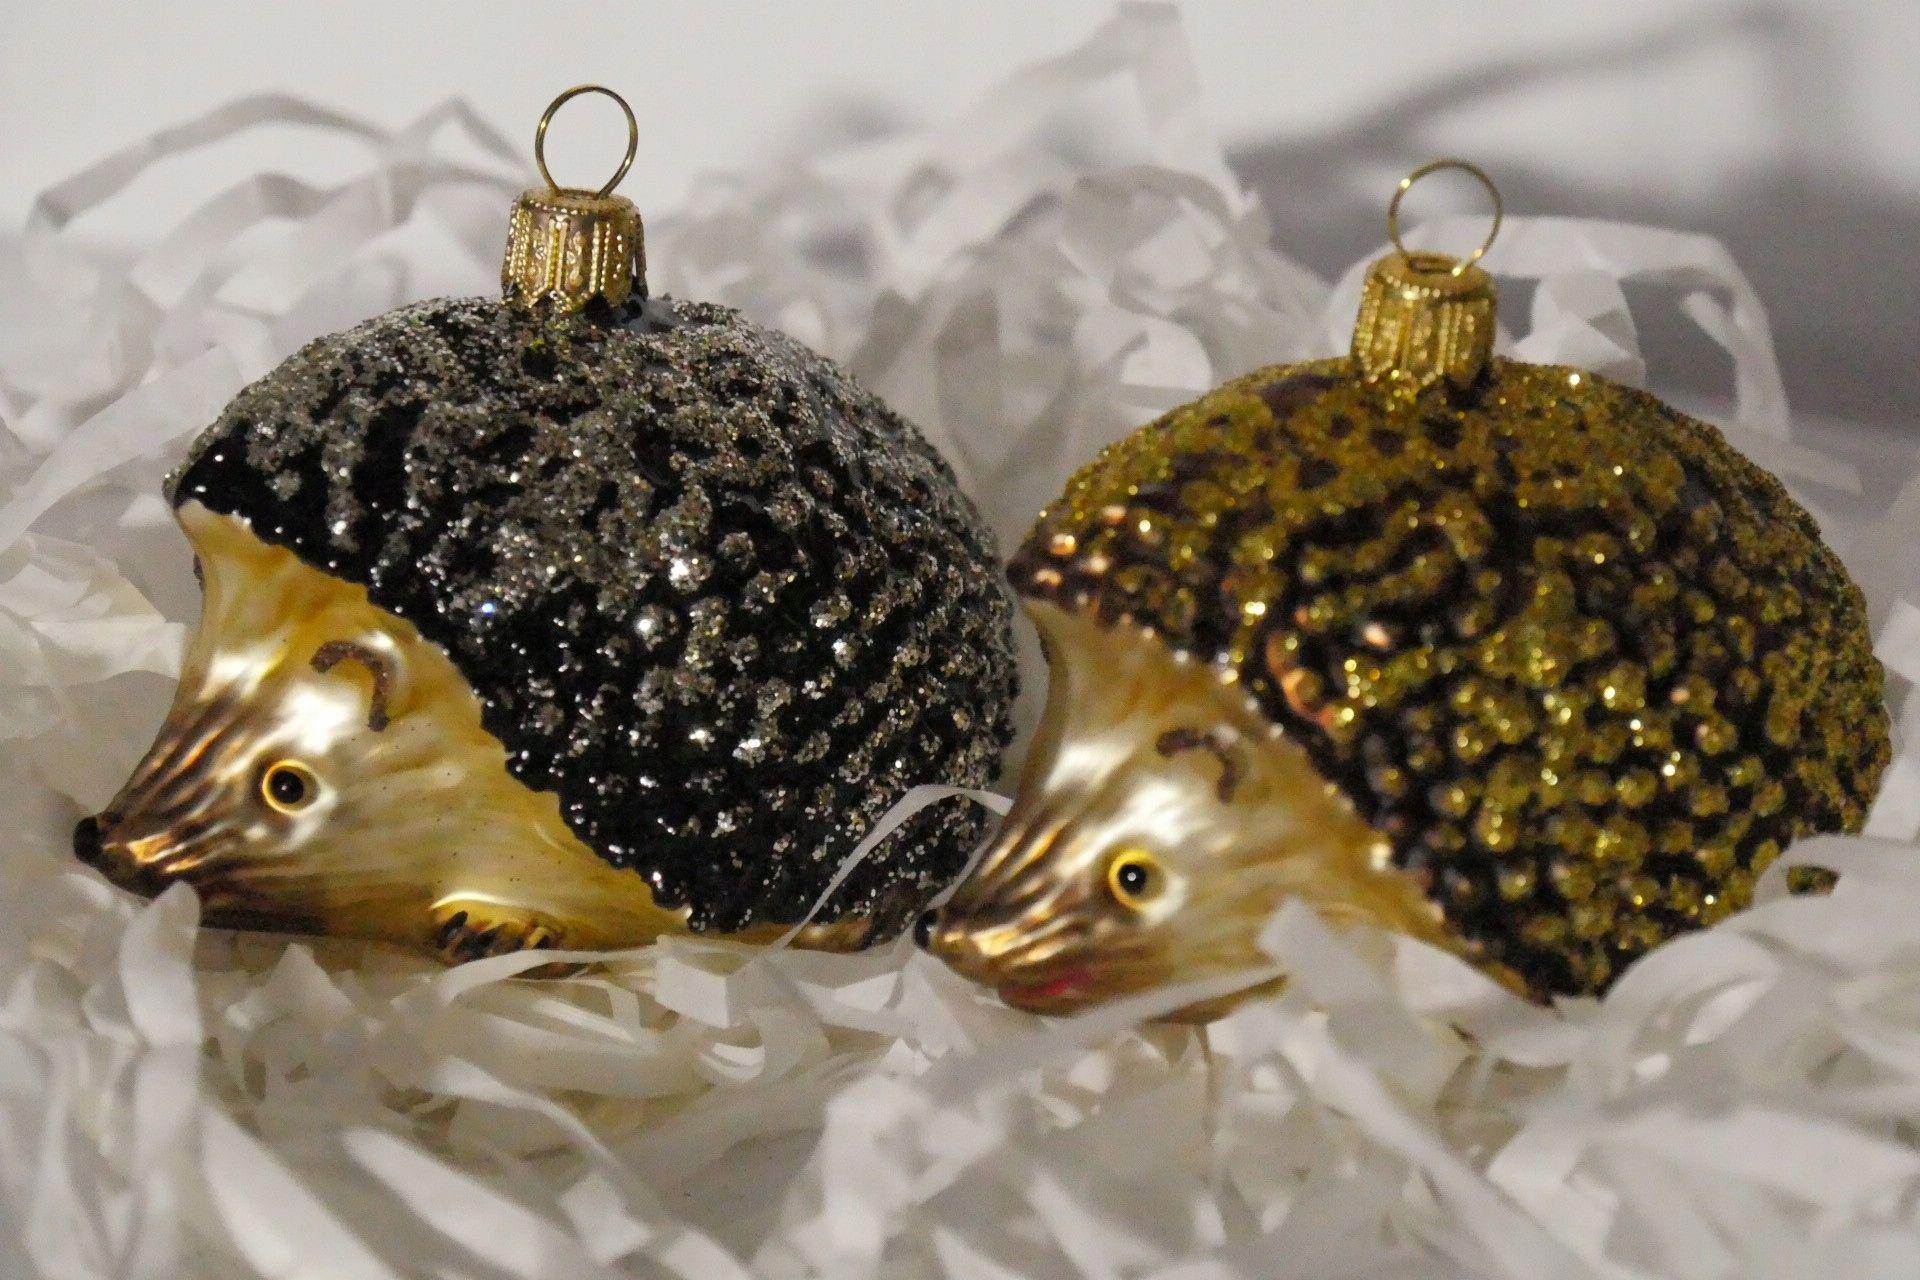 Jez Brokat L 644 Bombki Szklo Bombka 7681896123 Oficjalne Archiwum Allegro Christmas Bulbs Christmas Ornaments Holiday Decor